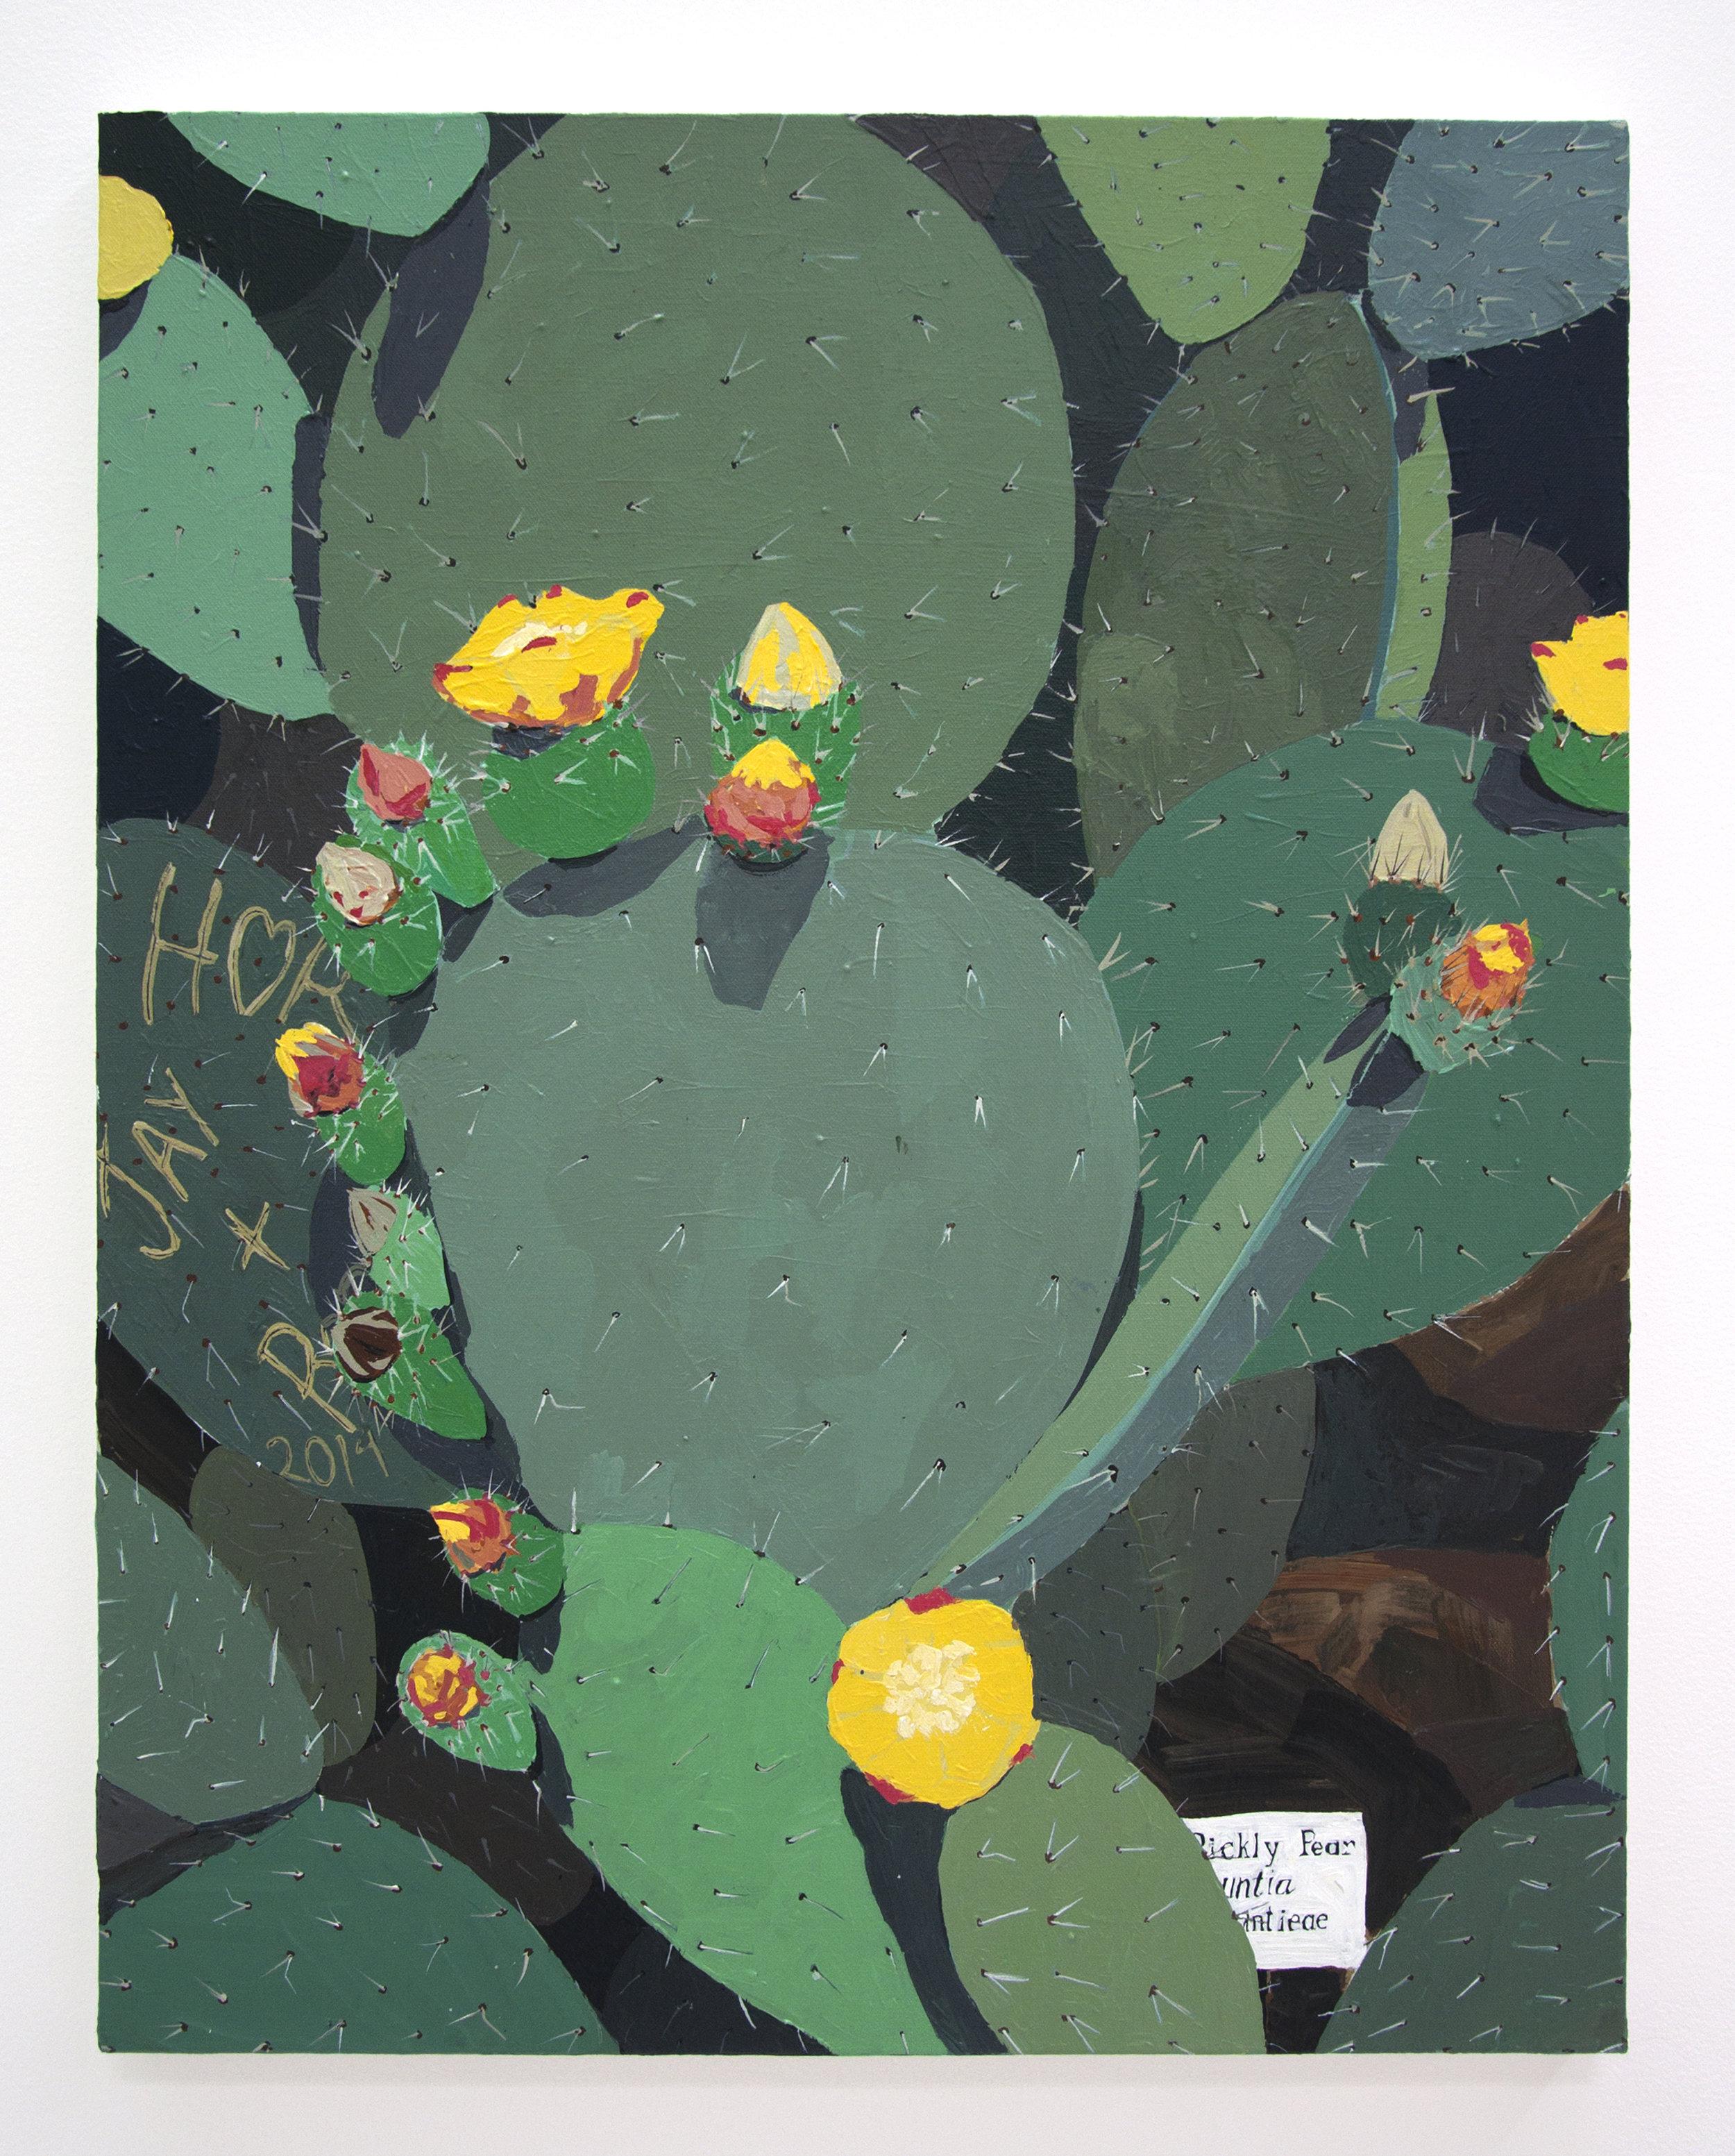 """Graffiti Cactus"", 2018, Acrylic on Canvas, 28 x 22in"